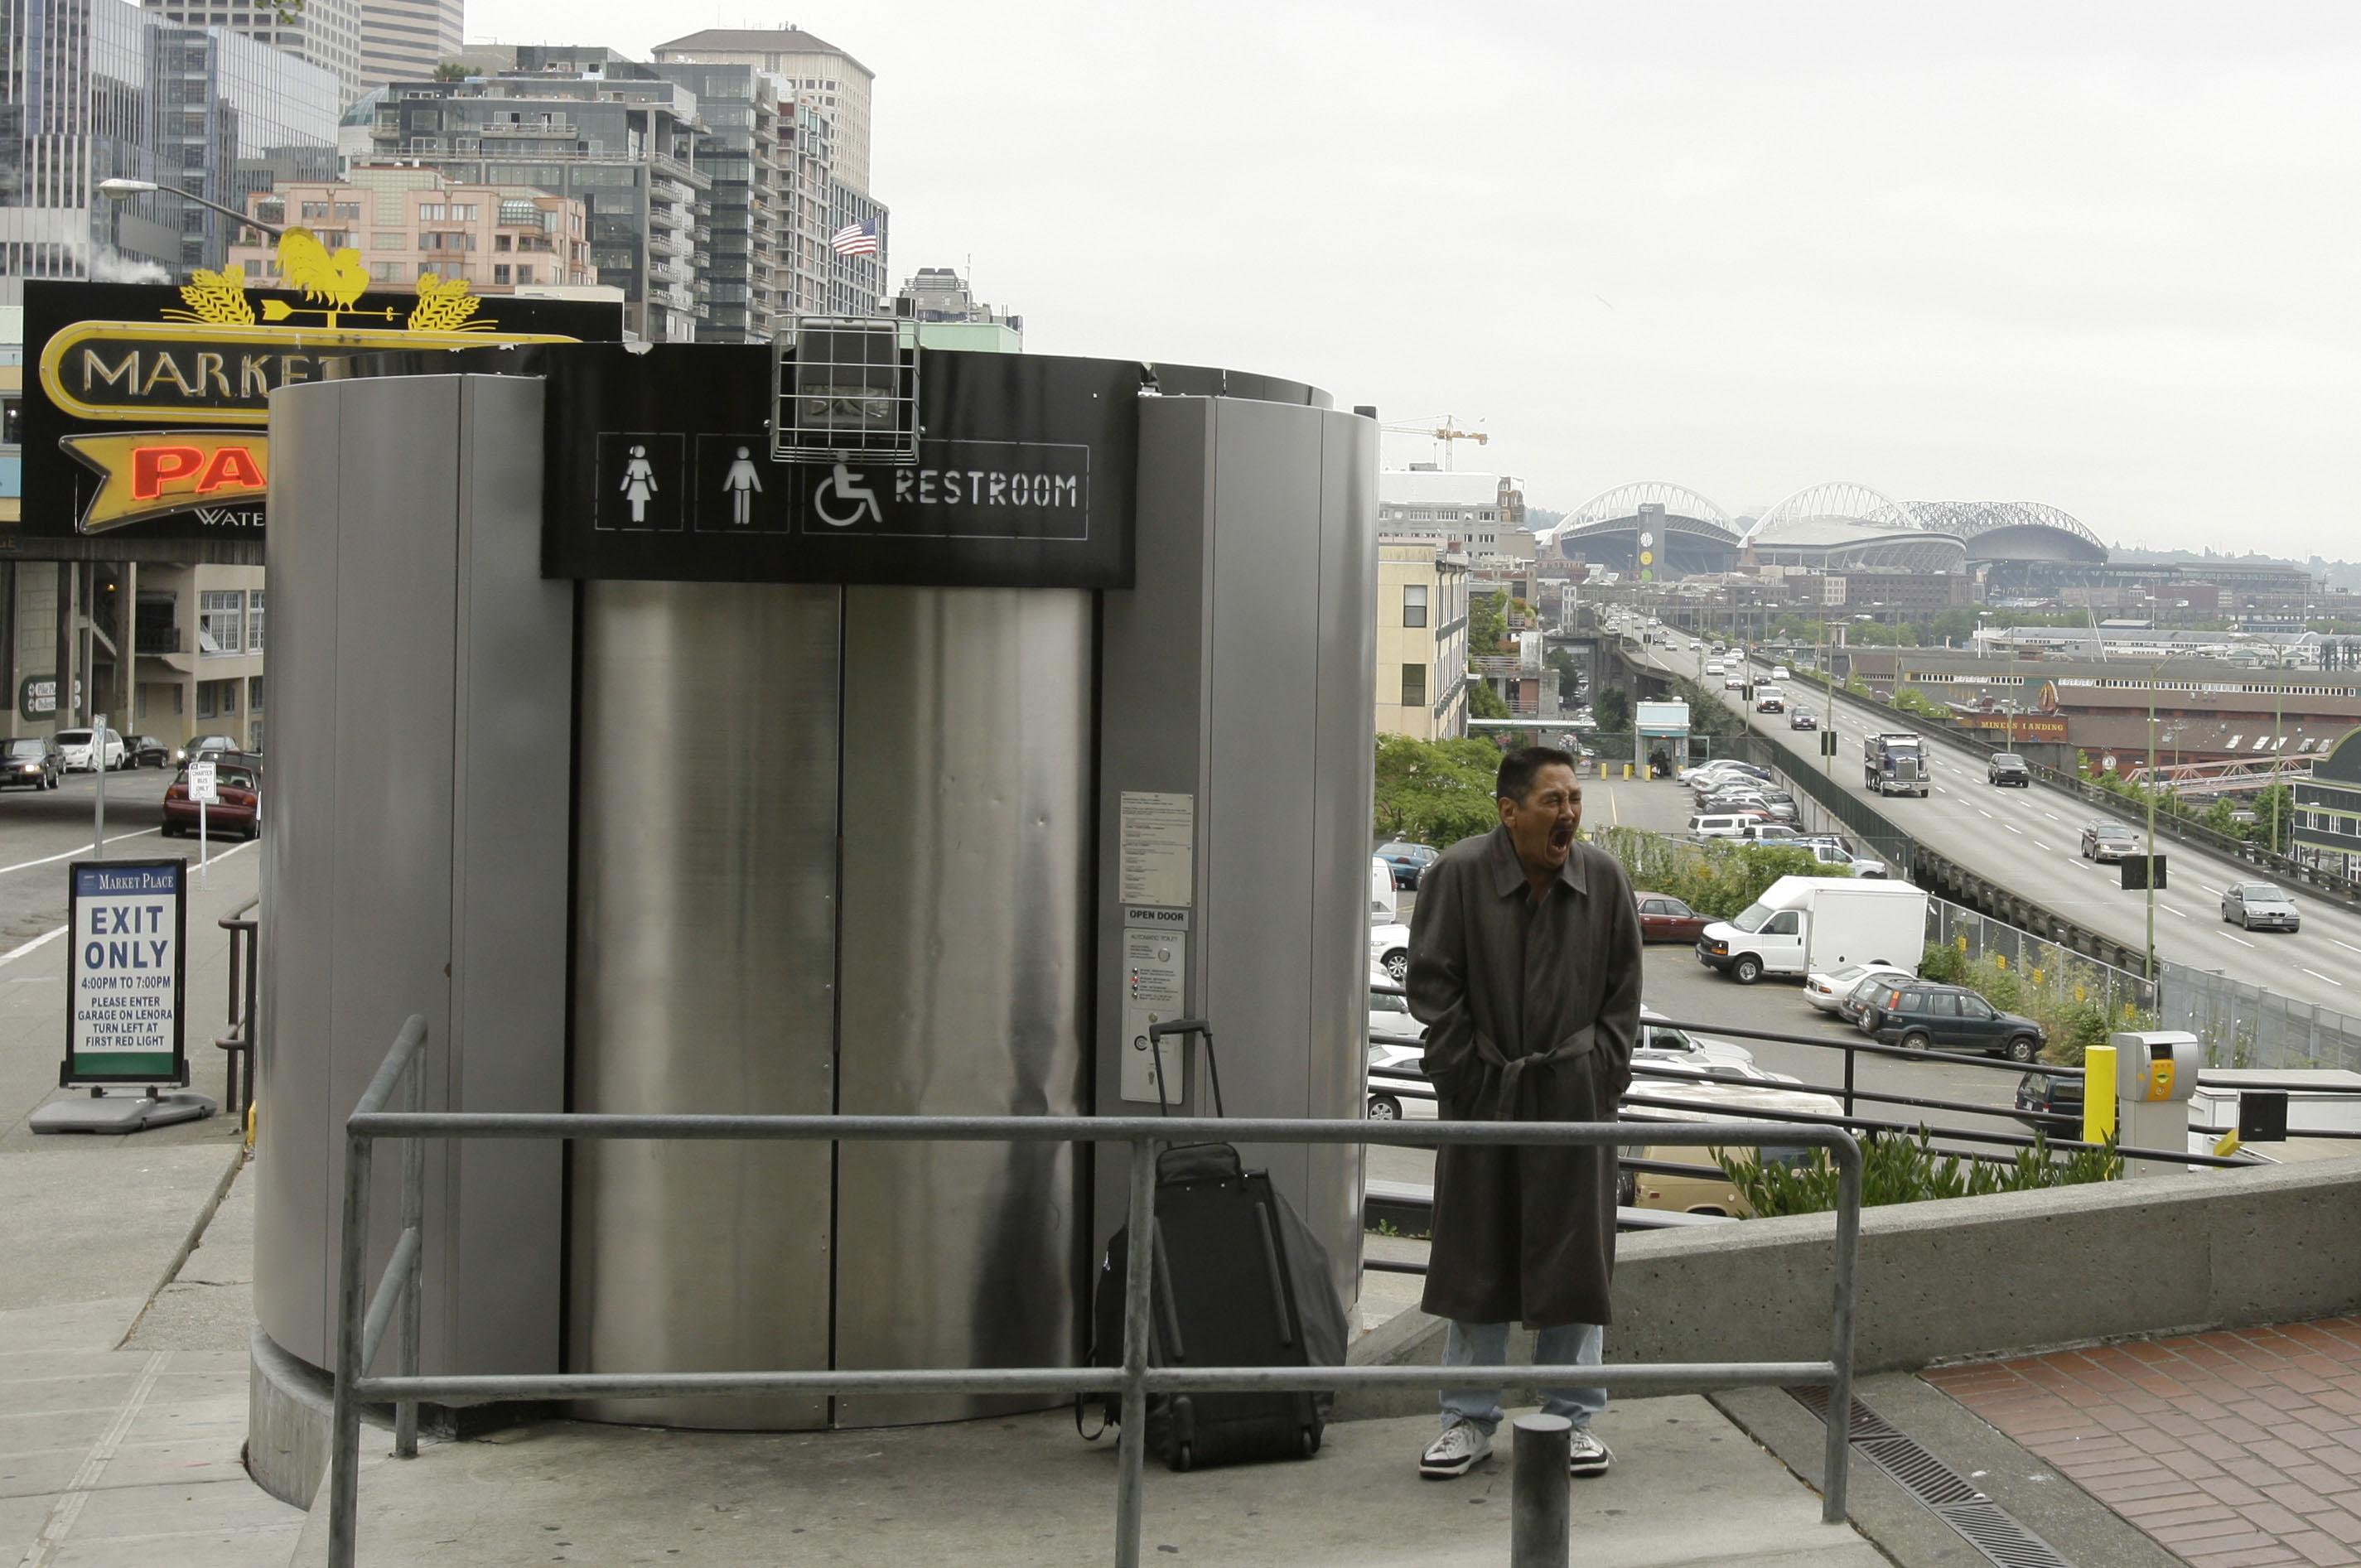 Seattle Sells Troublesome High Tech Toilets On Ebay The Spokesman